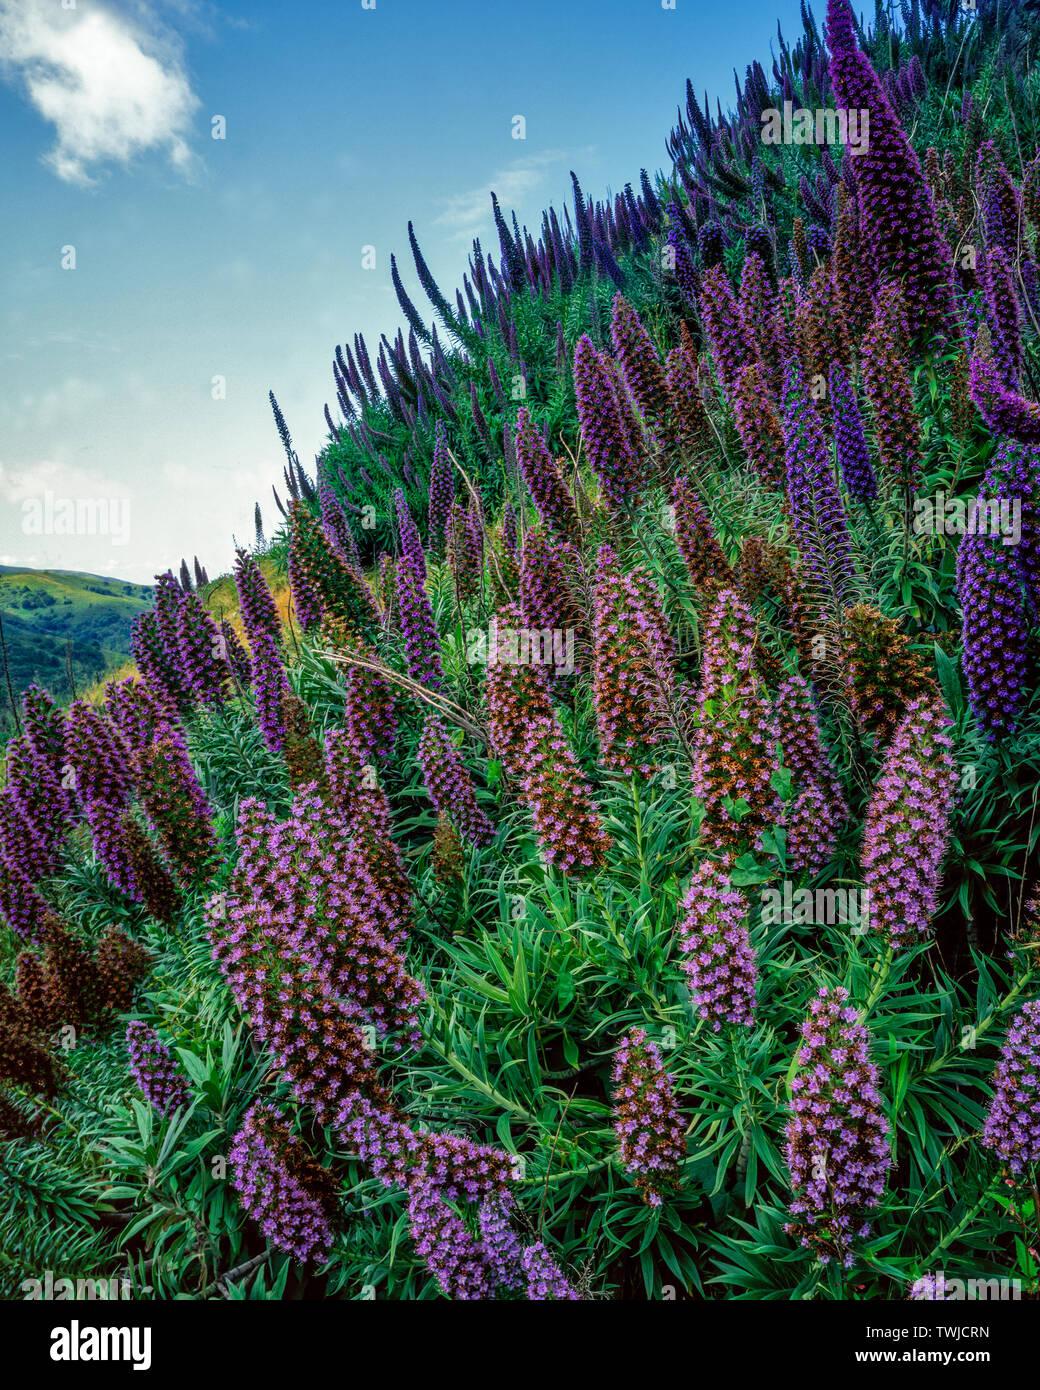 Echium, Echium candicans, Pride of Madera, Mount Tamalpais State Park, Marin County, California - Stock Image